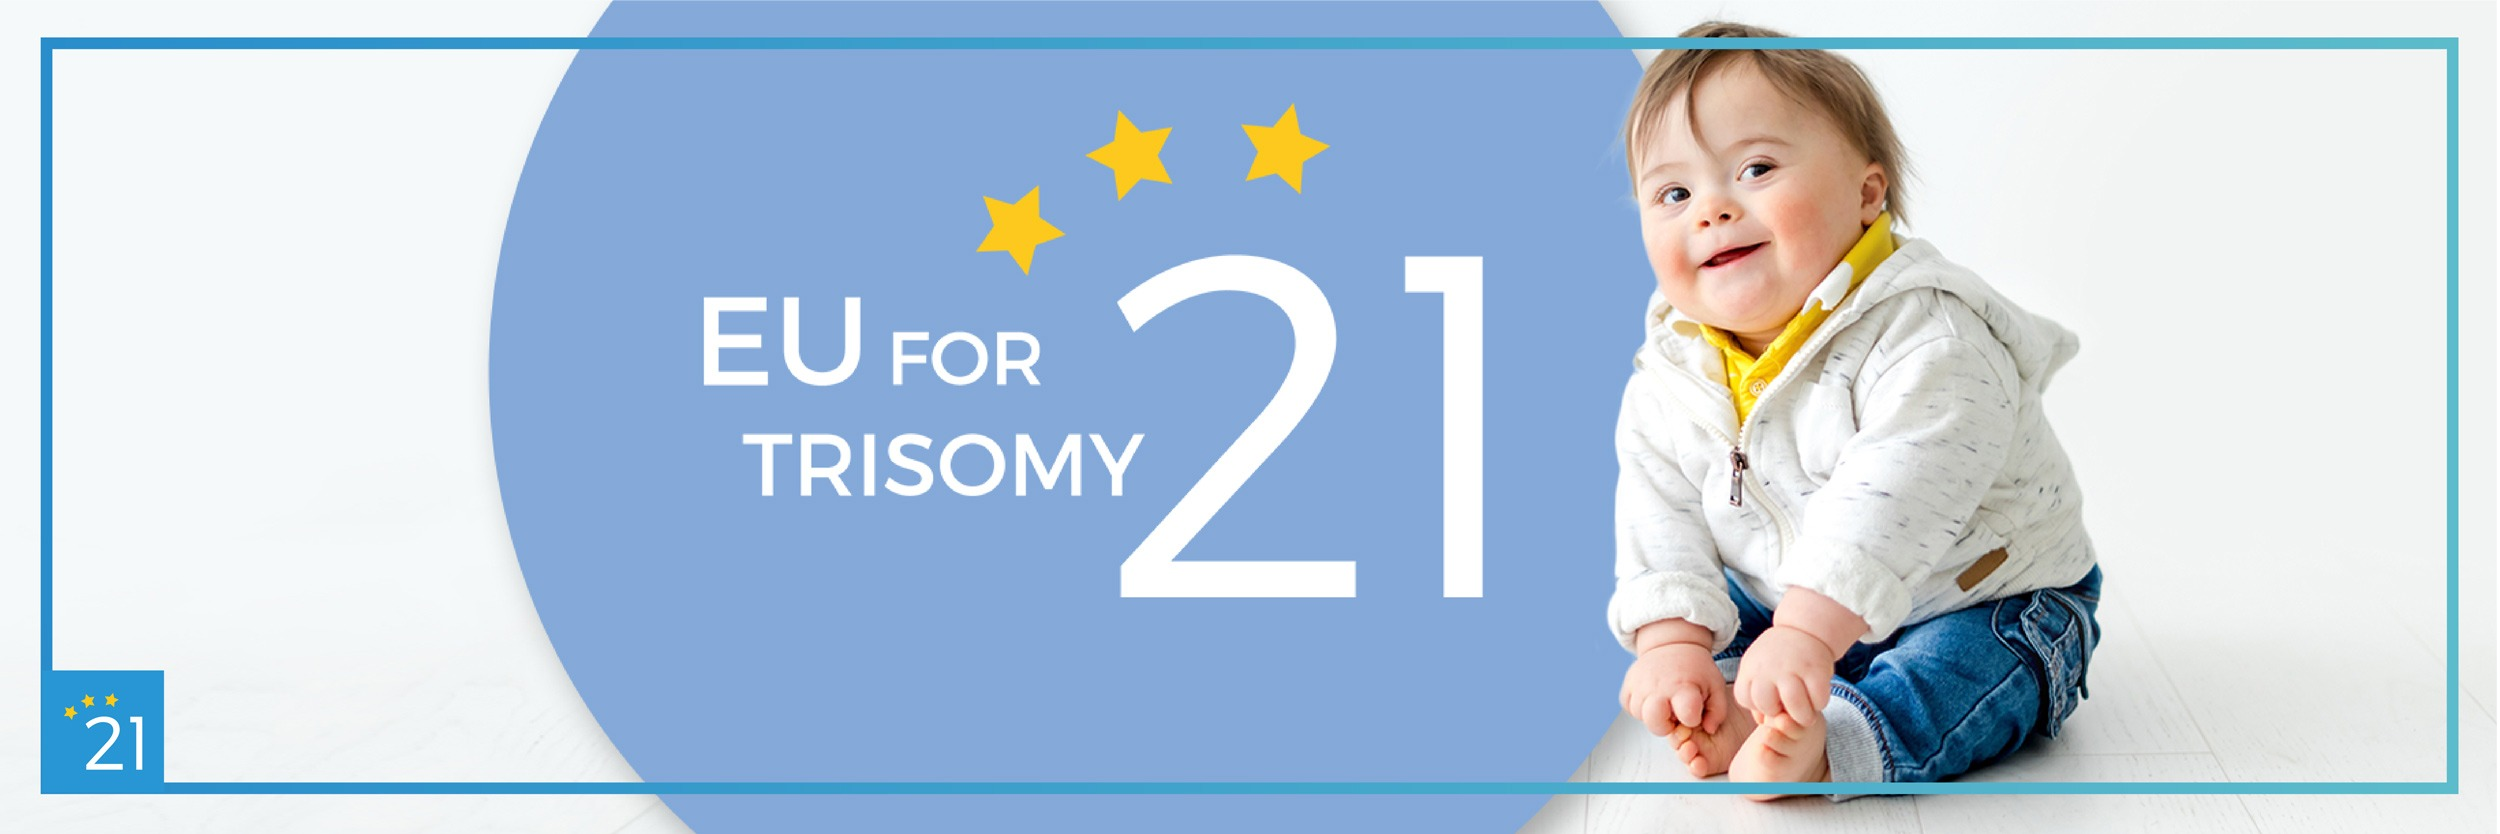 EuforTrisomy21_Home